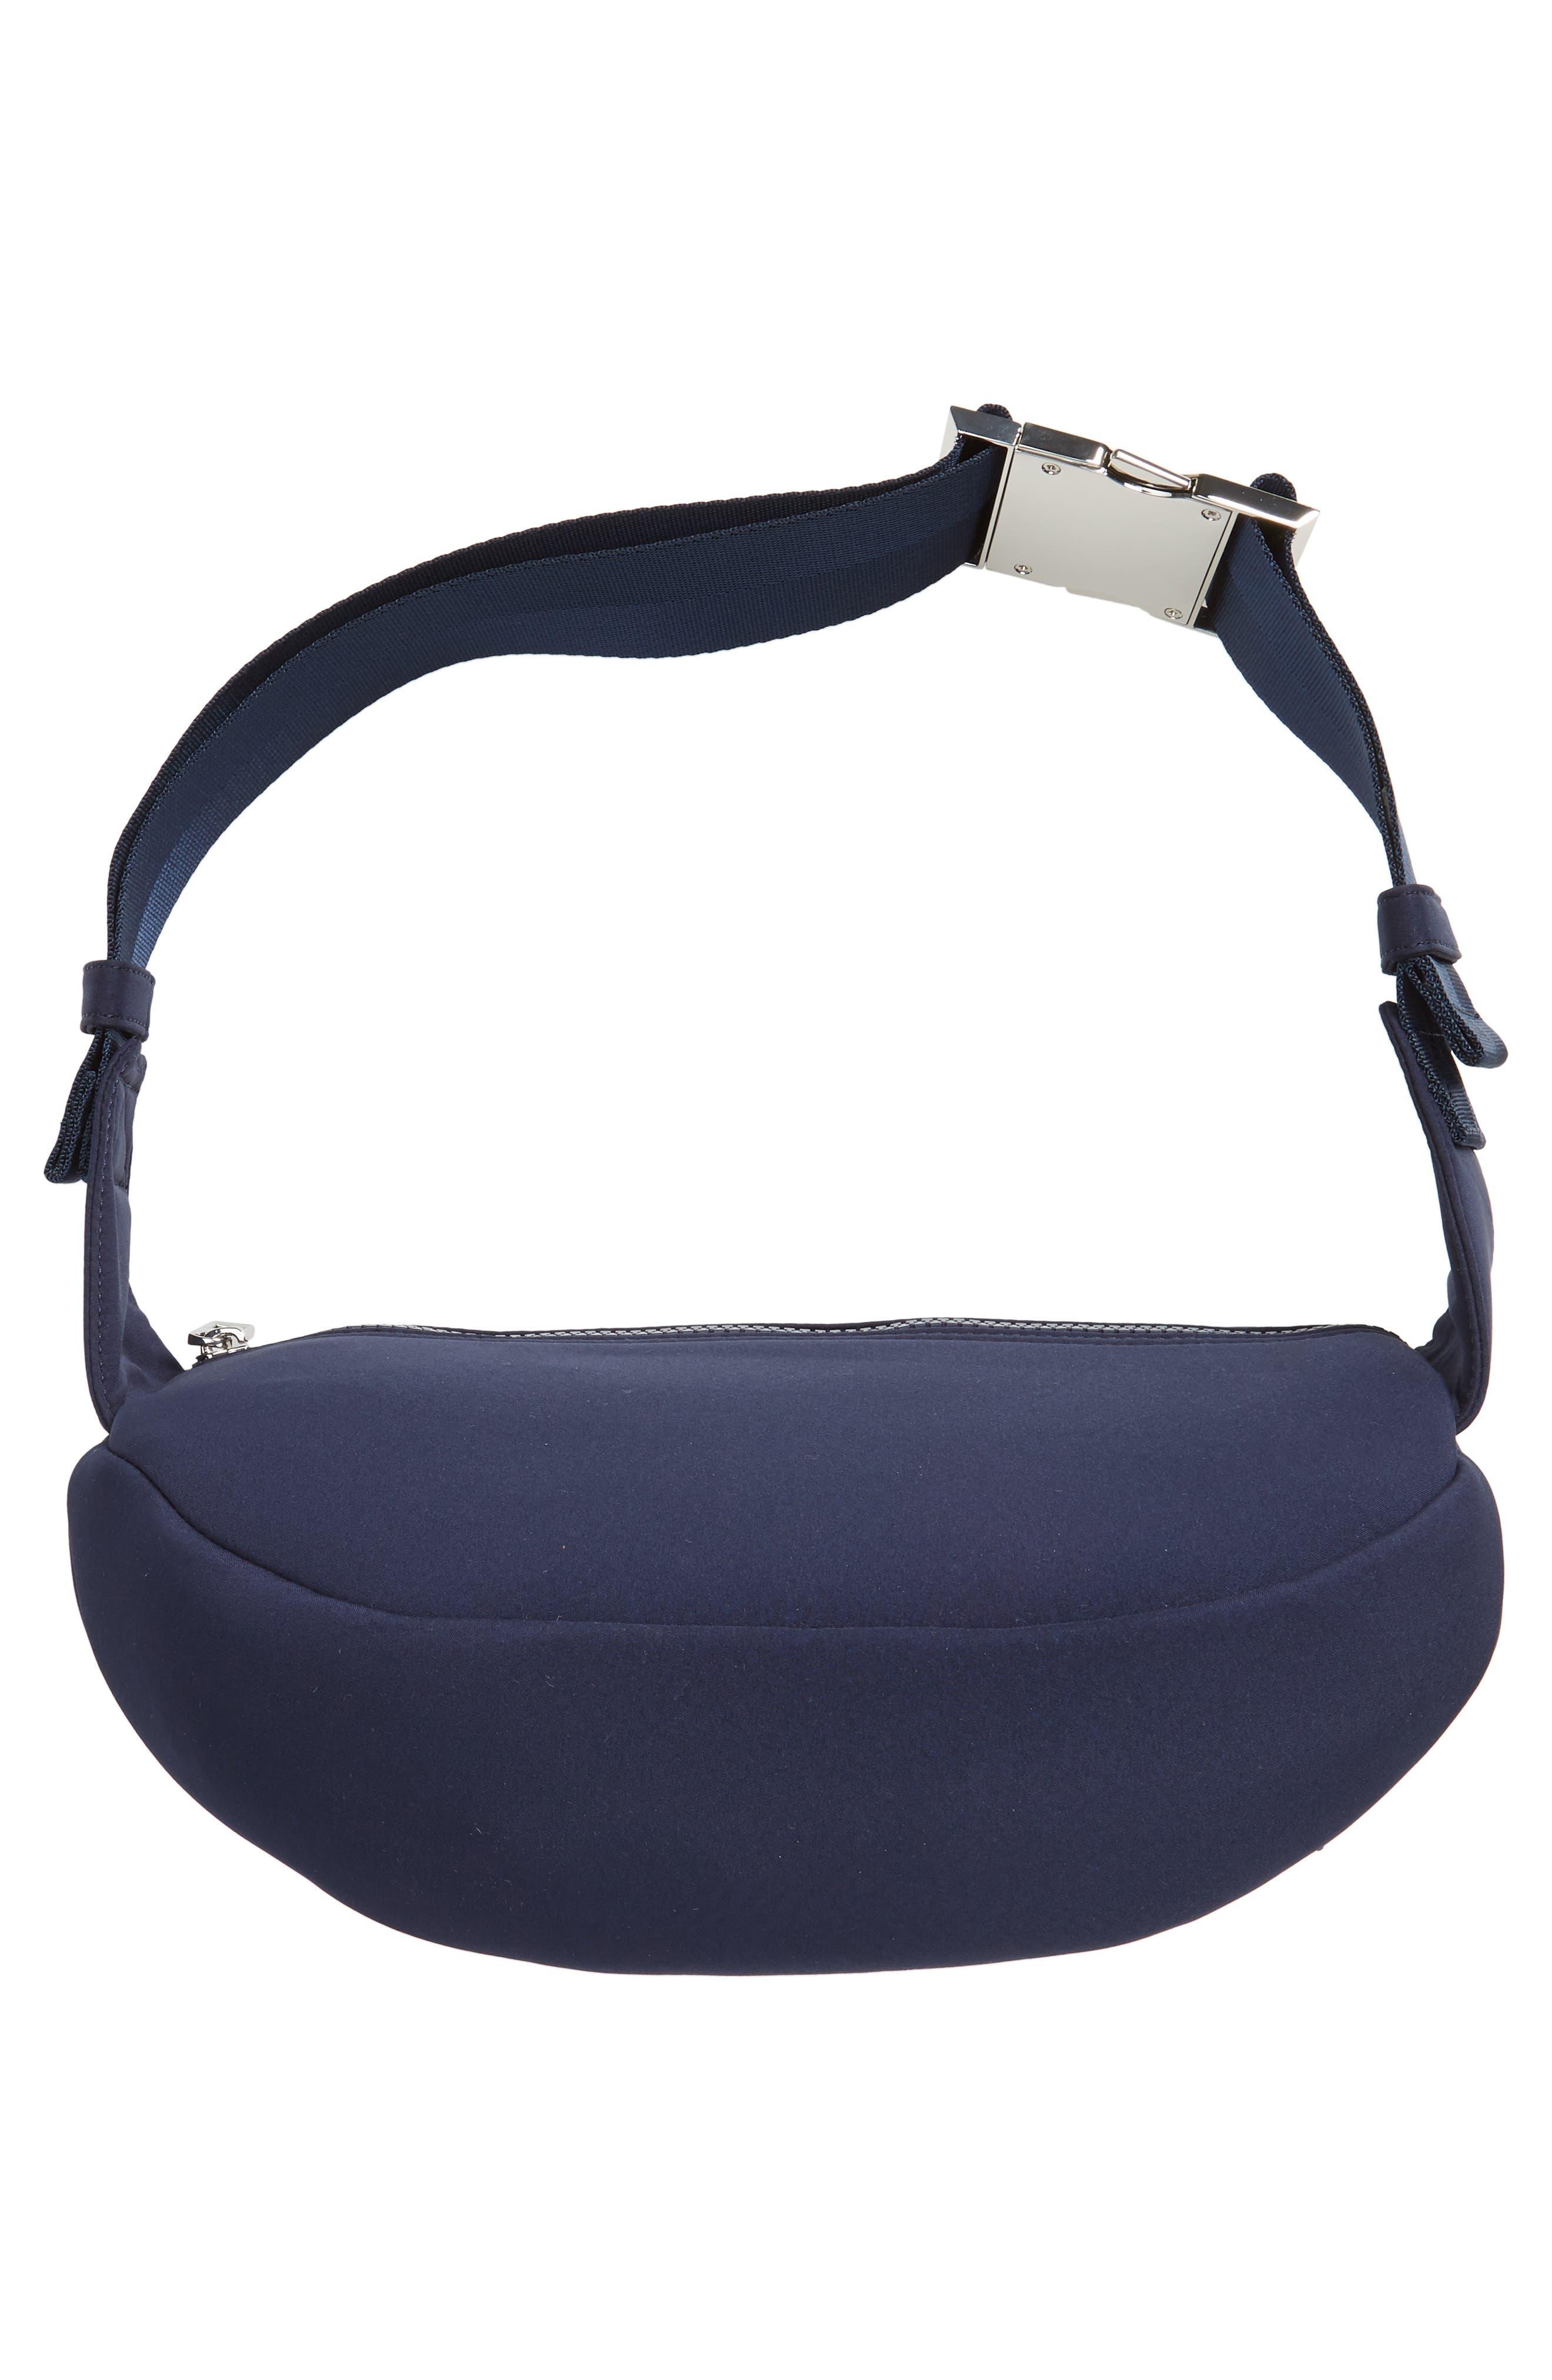 KENZO, Embroidered Tiger Belt Bag, Alternate thumbnail 7, color, 76A NAVY BLUE